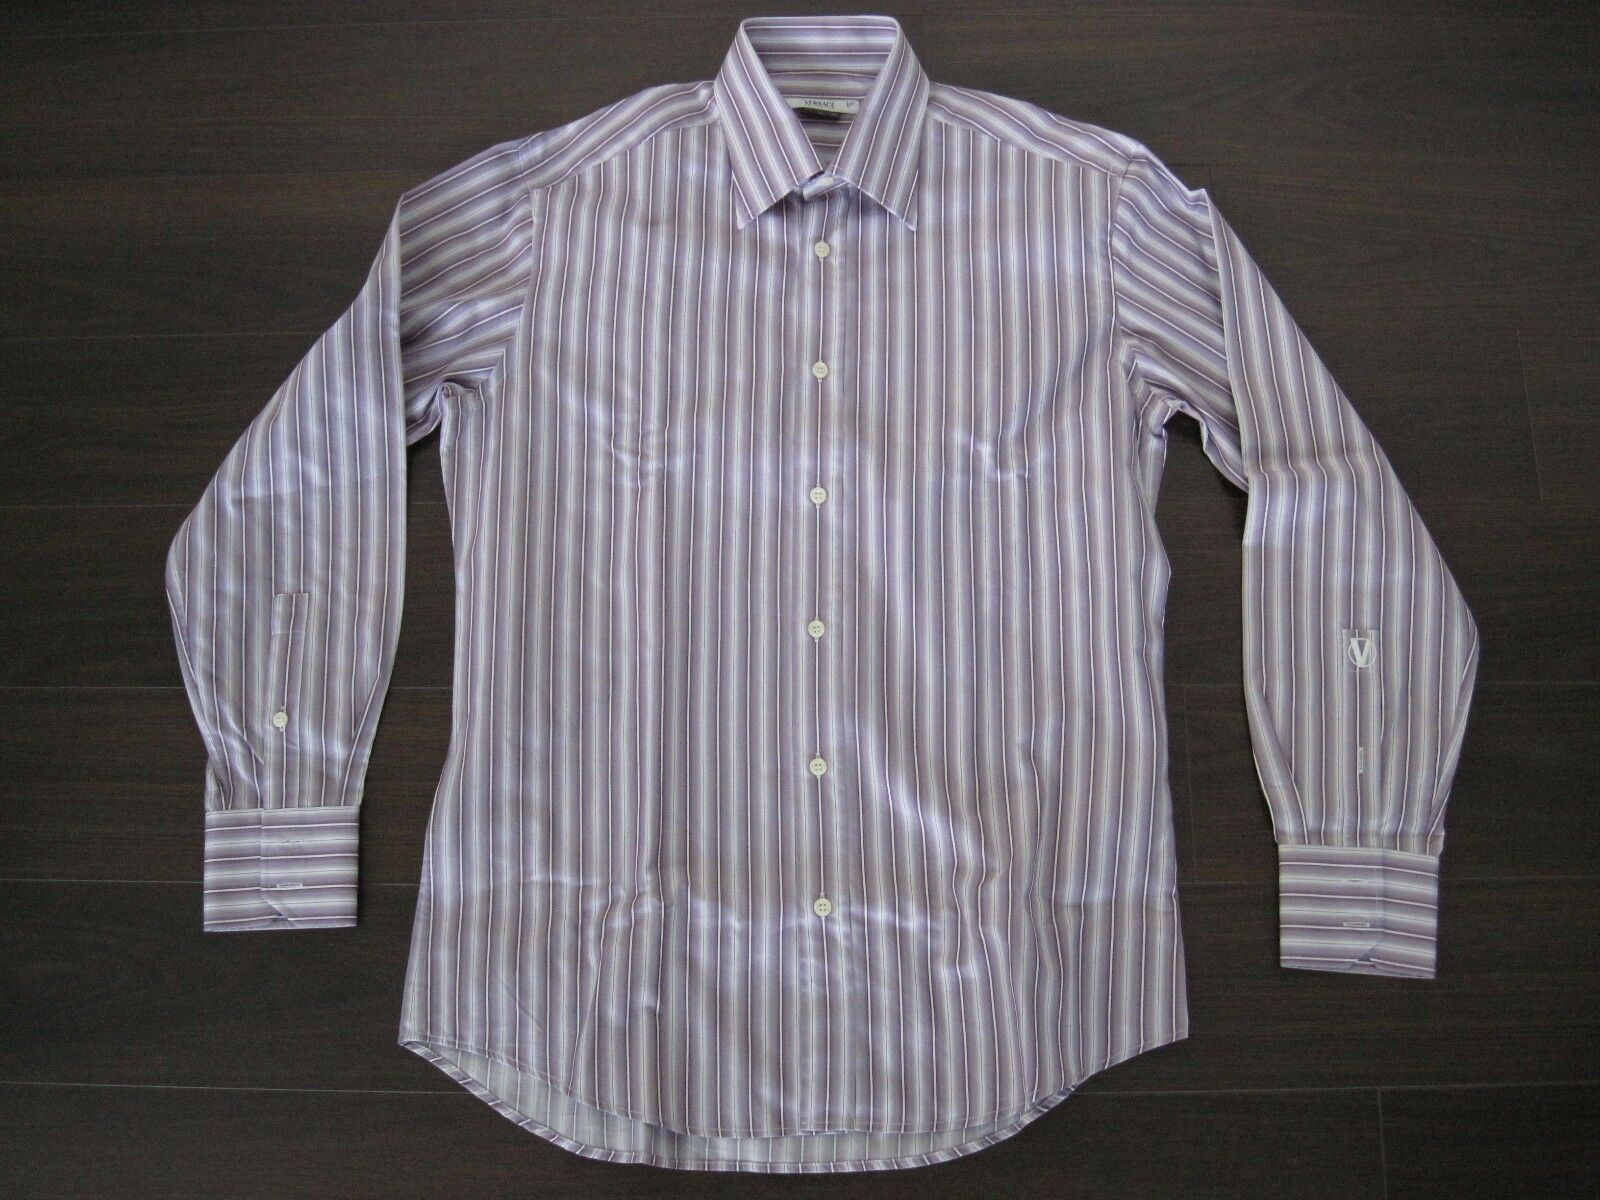 NWOT Versace Collection lila Striped Pin Dress Shirt 15 ¾ 40 sz. 250+